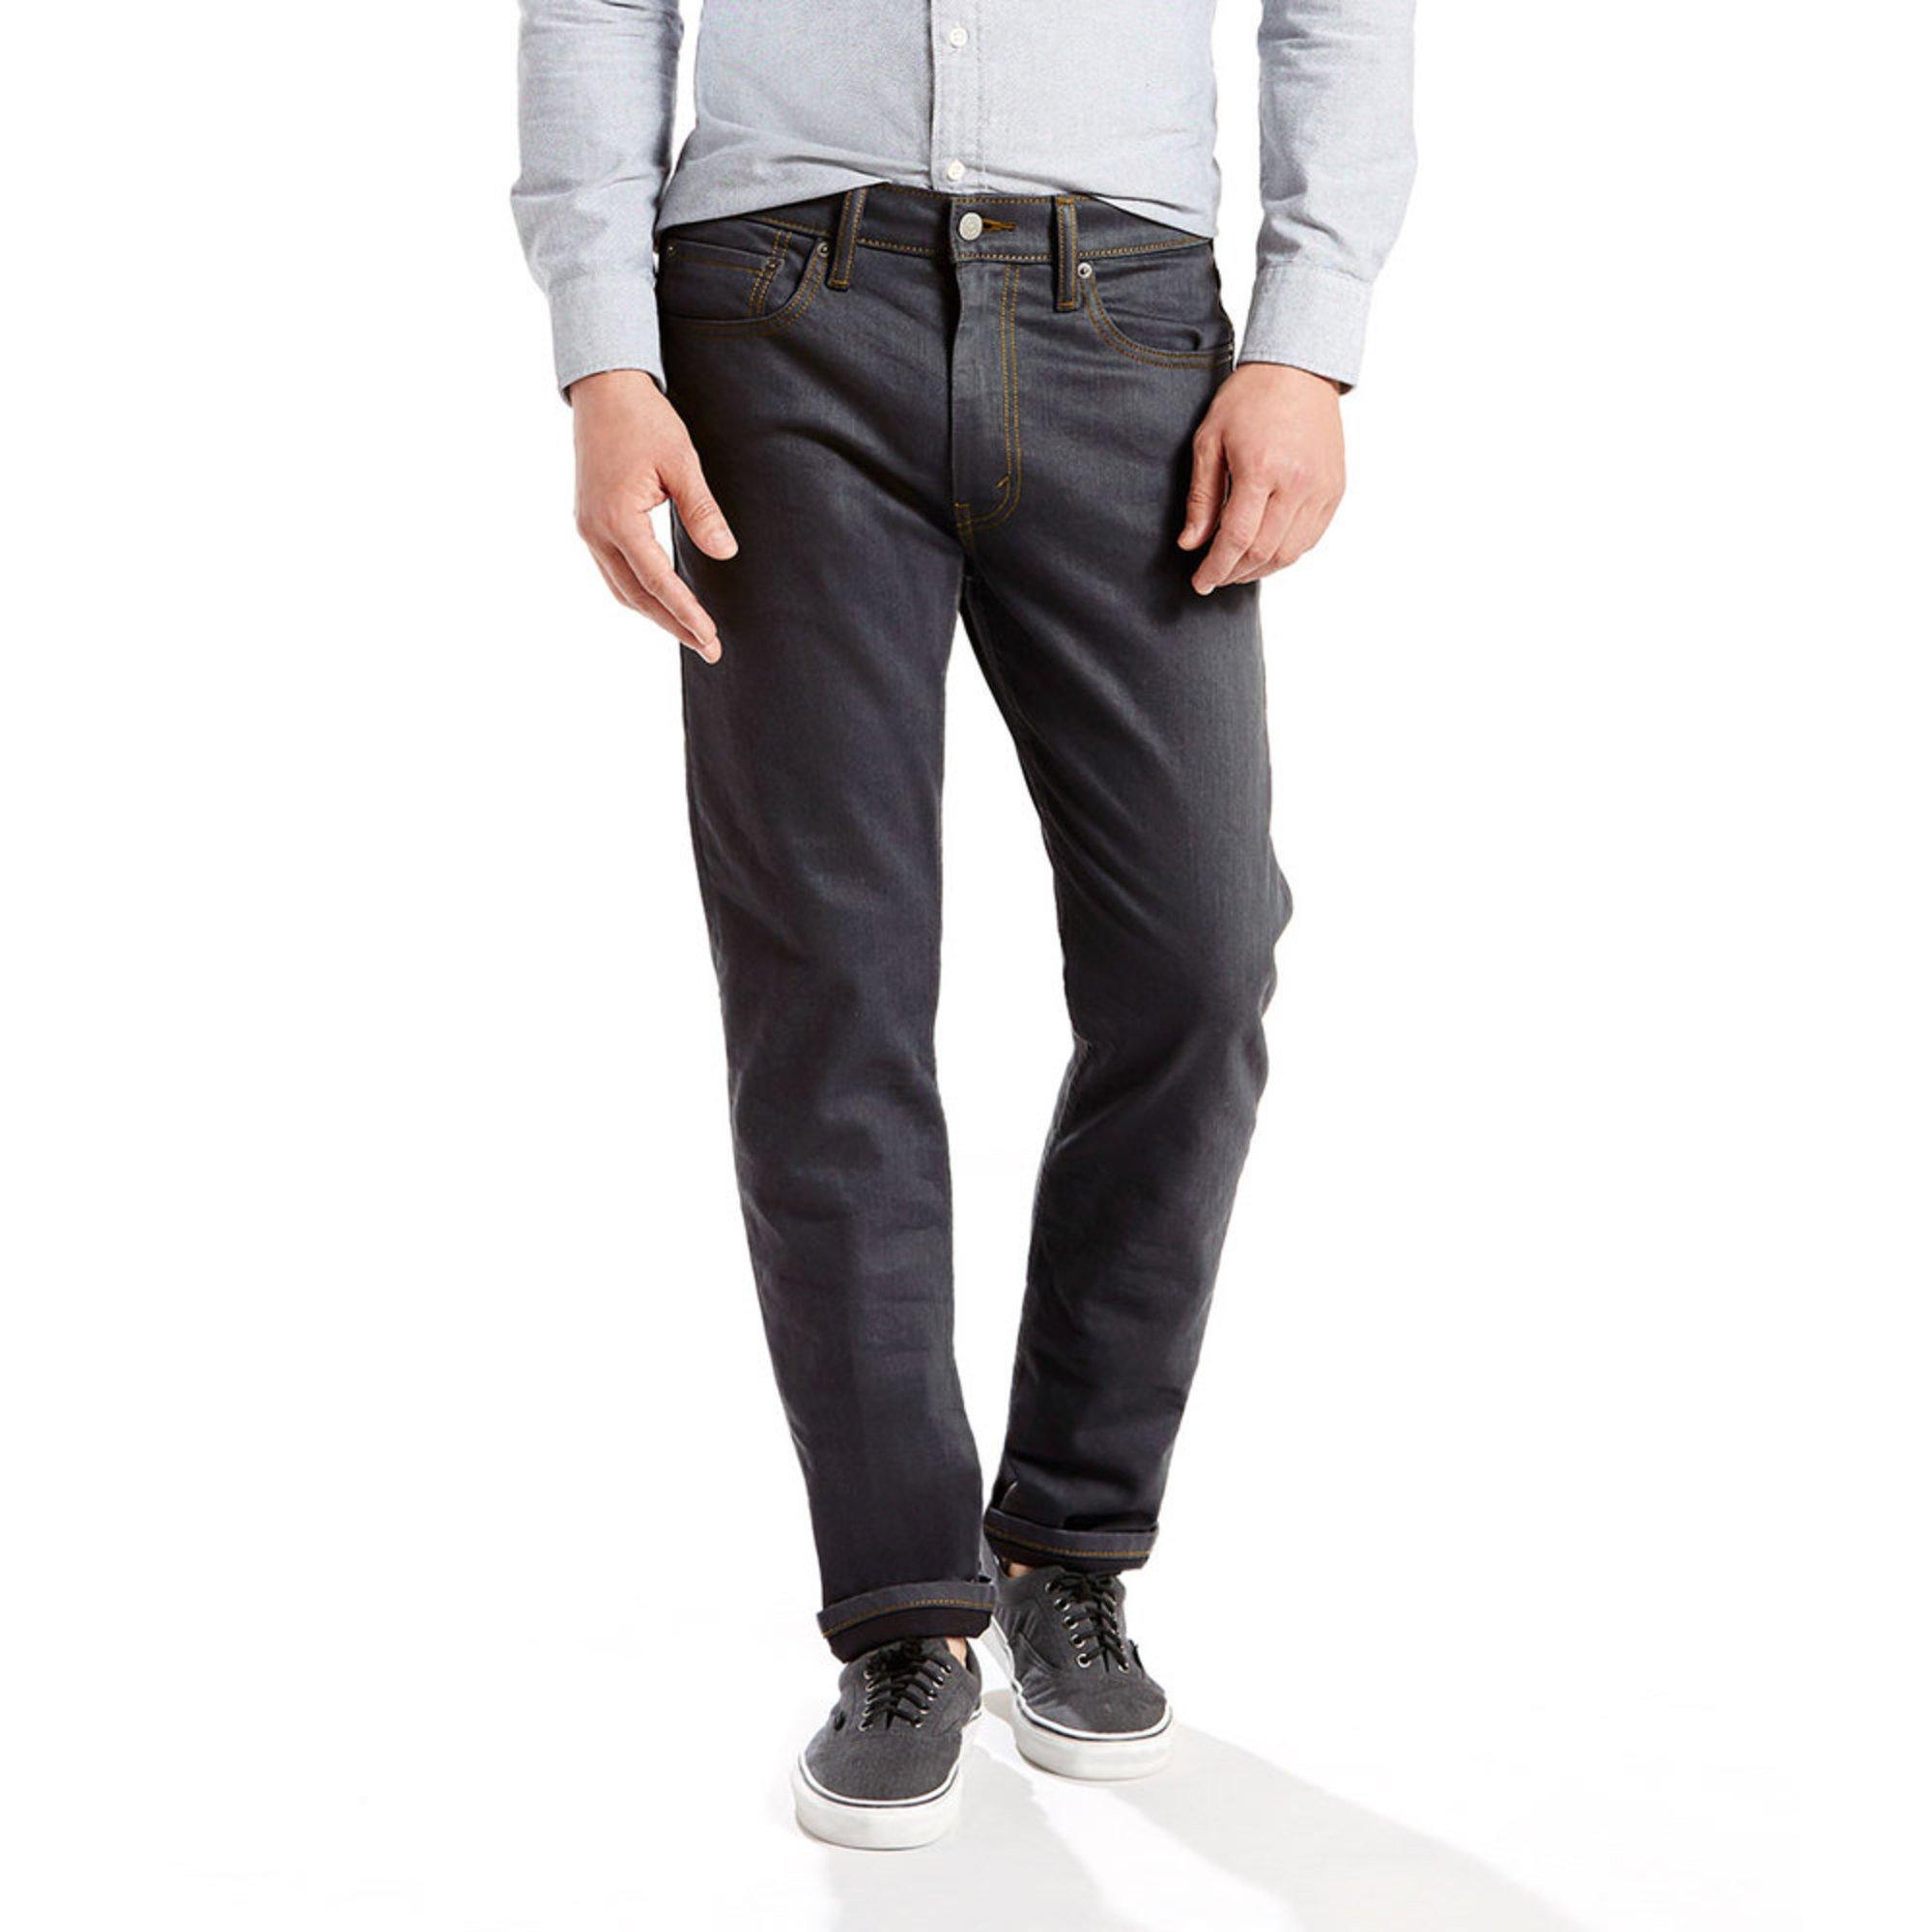 6657a7f36f6 Levi's Men's 502 Regular Fit Taper Leg Jeans | Men's Jeans | Apparel ...